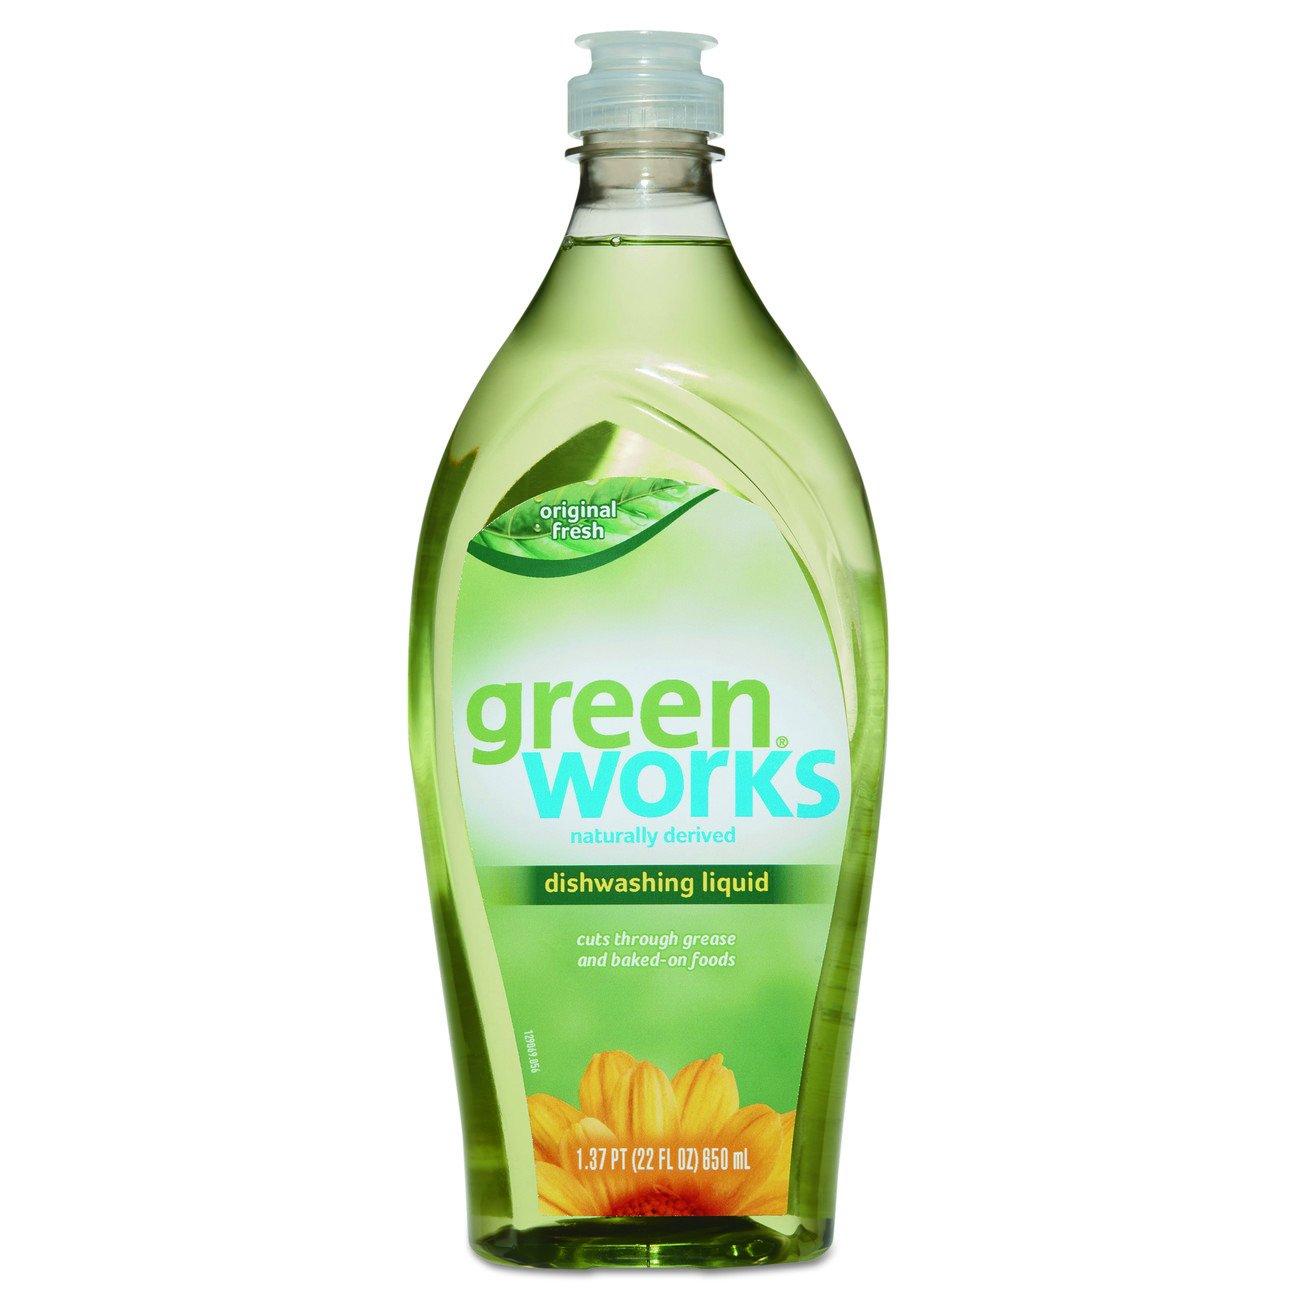 Green Works 31207 Manual Dishwashing Liquid Detergent, Original Fresh Scent, 22 oz. Volume, Ceramic, Corian (Pack of 6) by Greenworks